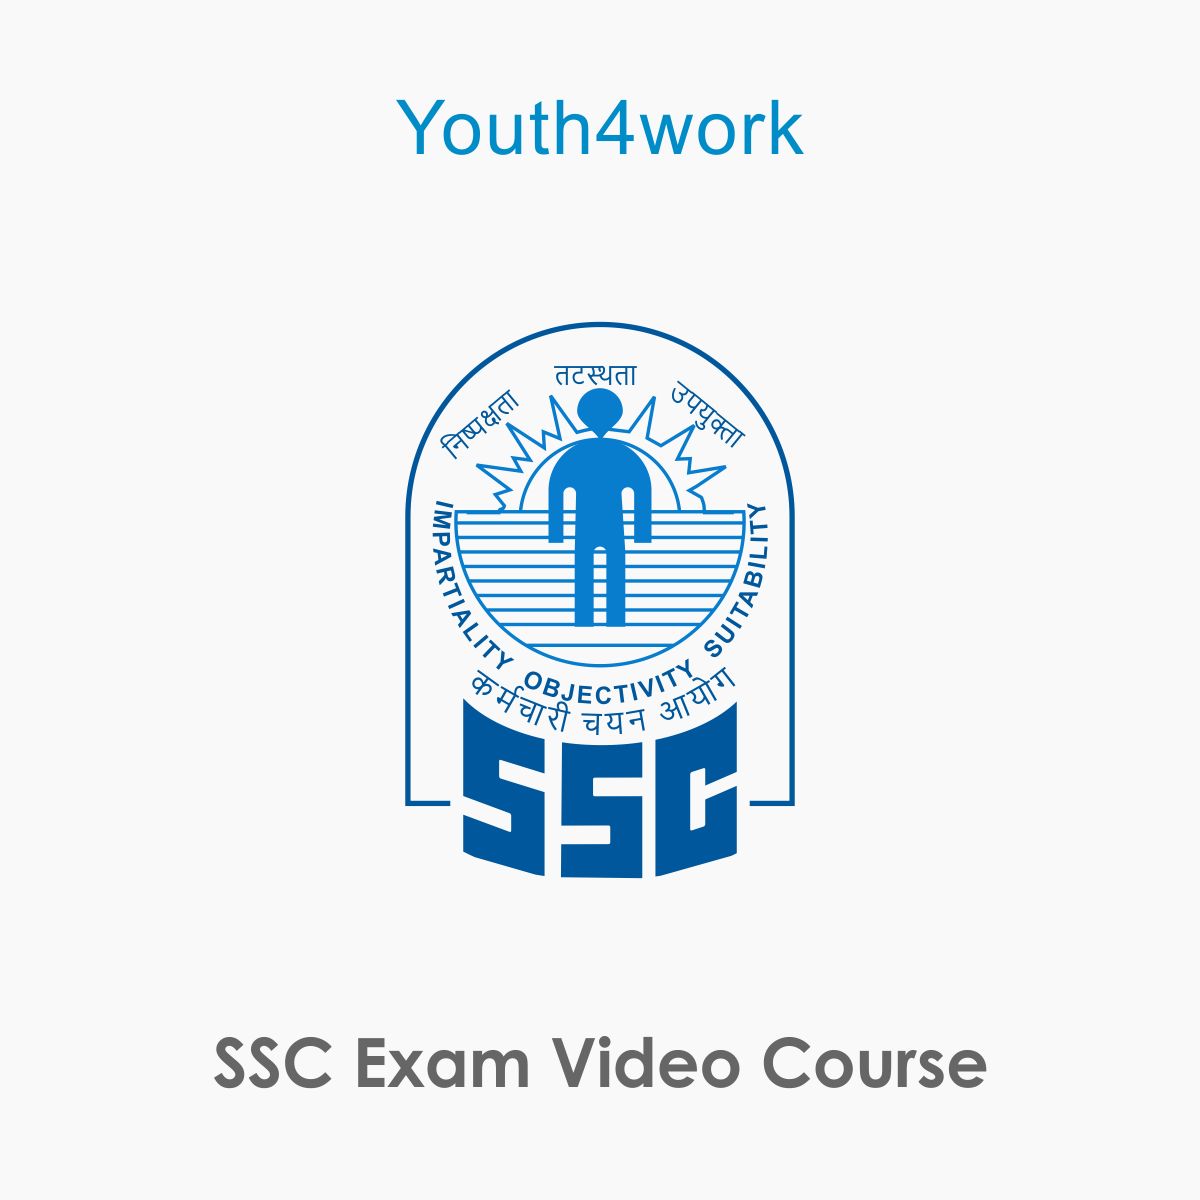 SSC exam video course